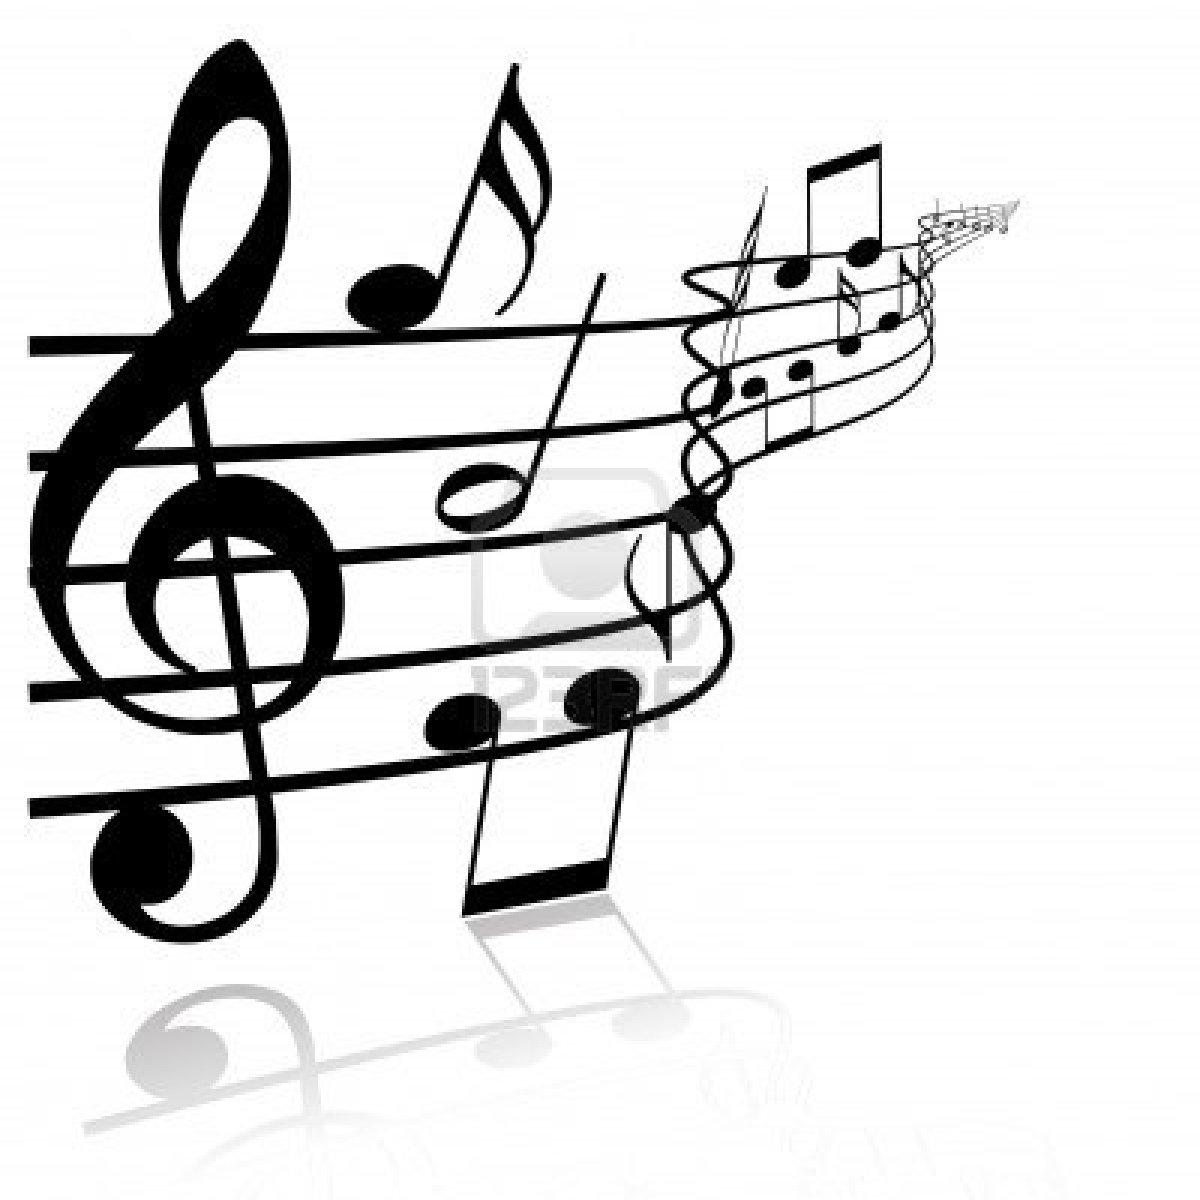 music lessons clip art - photo #30